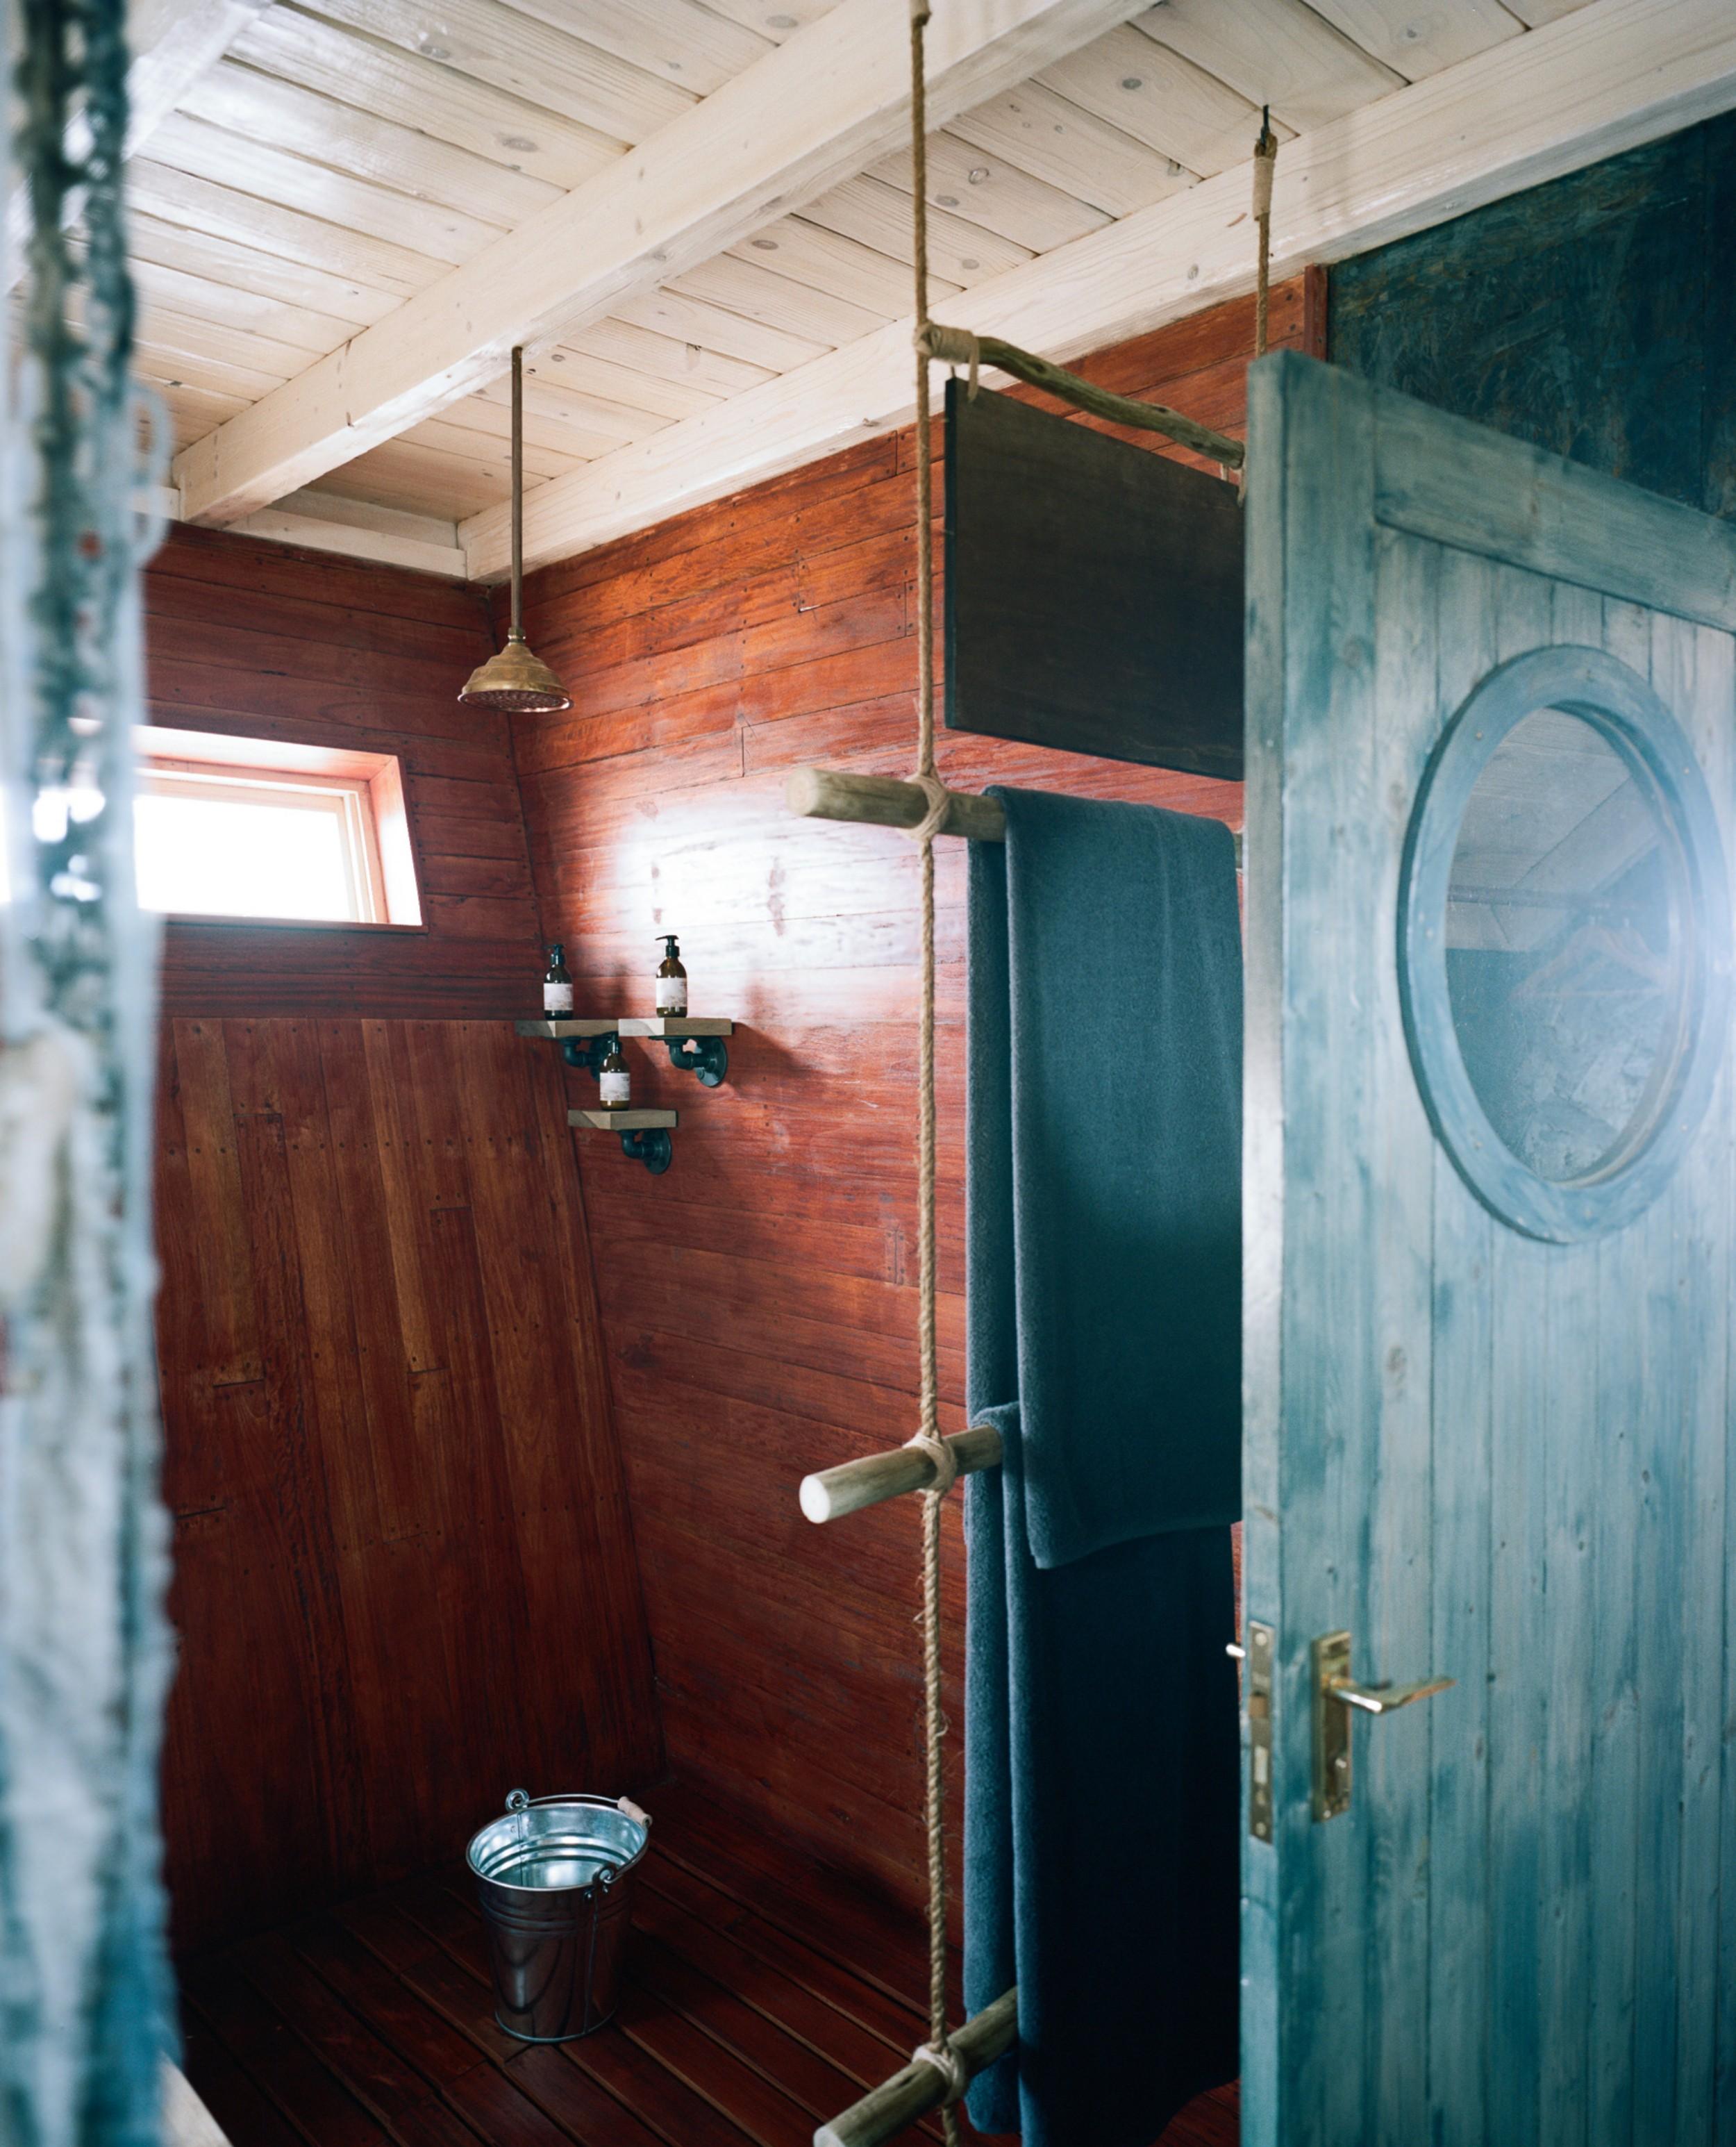 10Shipwreck Lodge - Accommodation - Bathroom layout.jpg